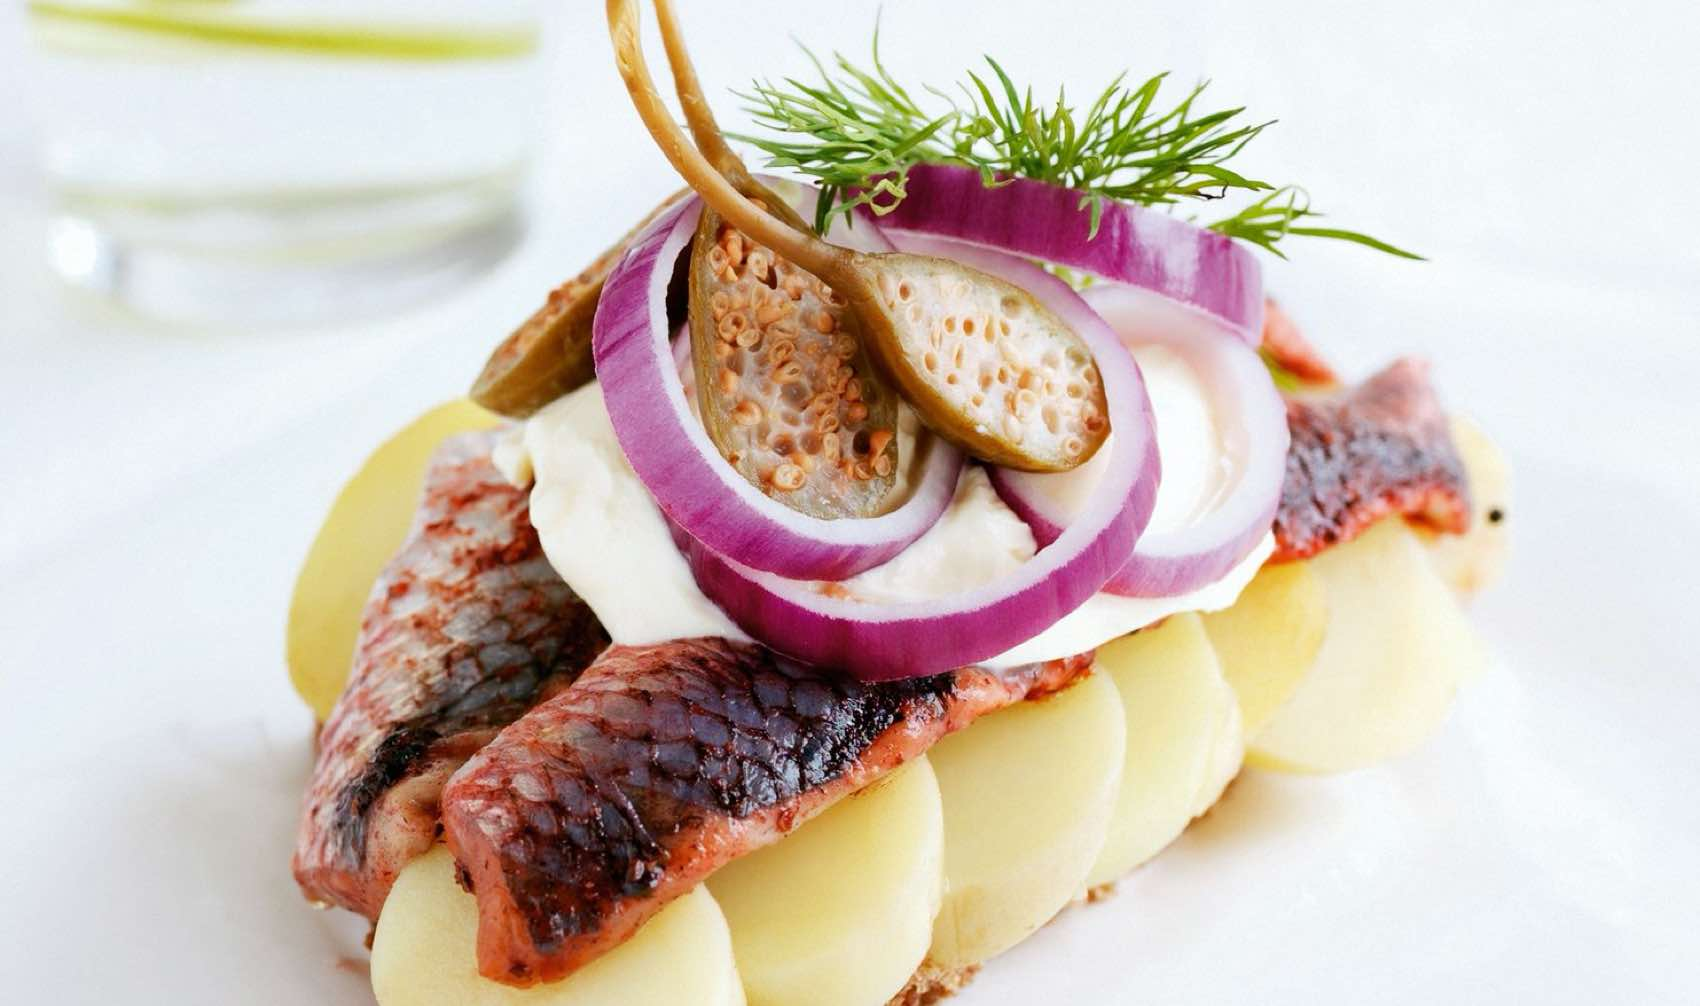 Smørrebrød with fish and potatoes